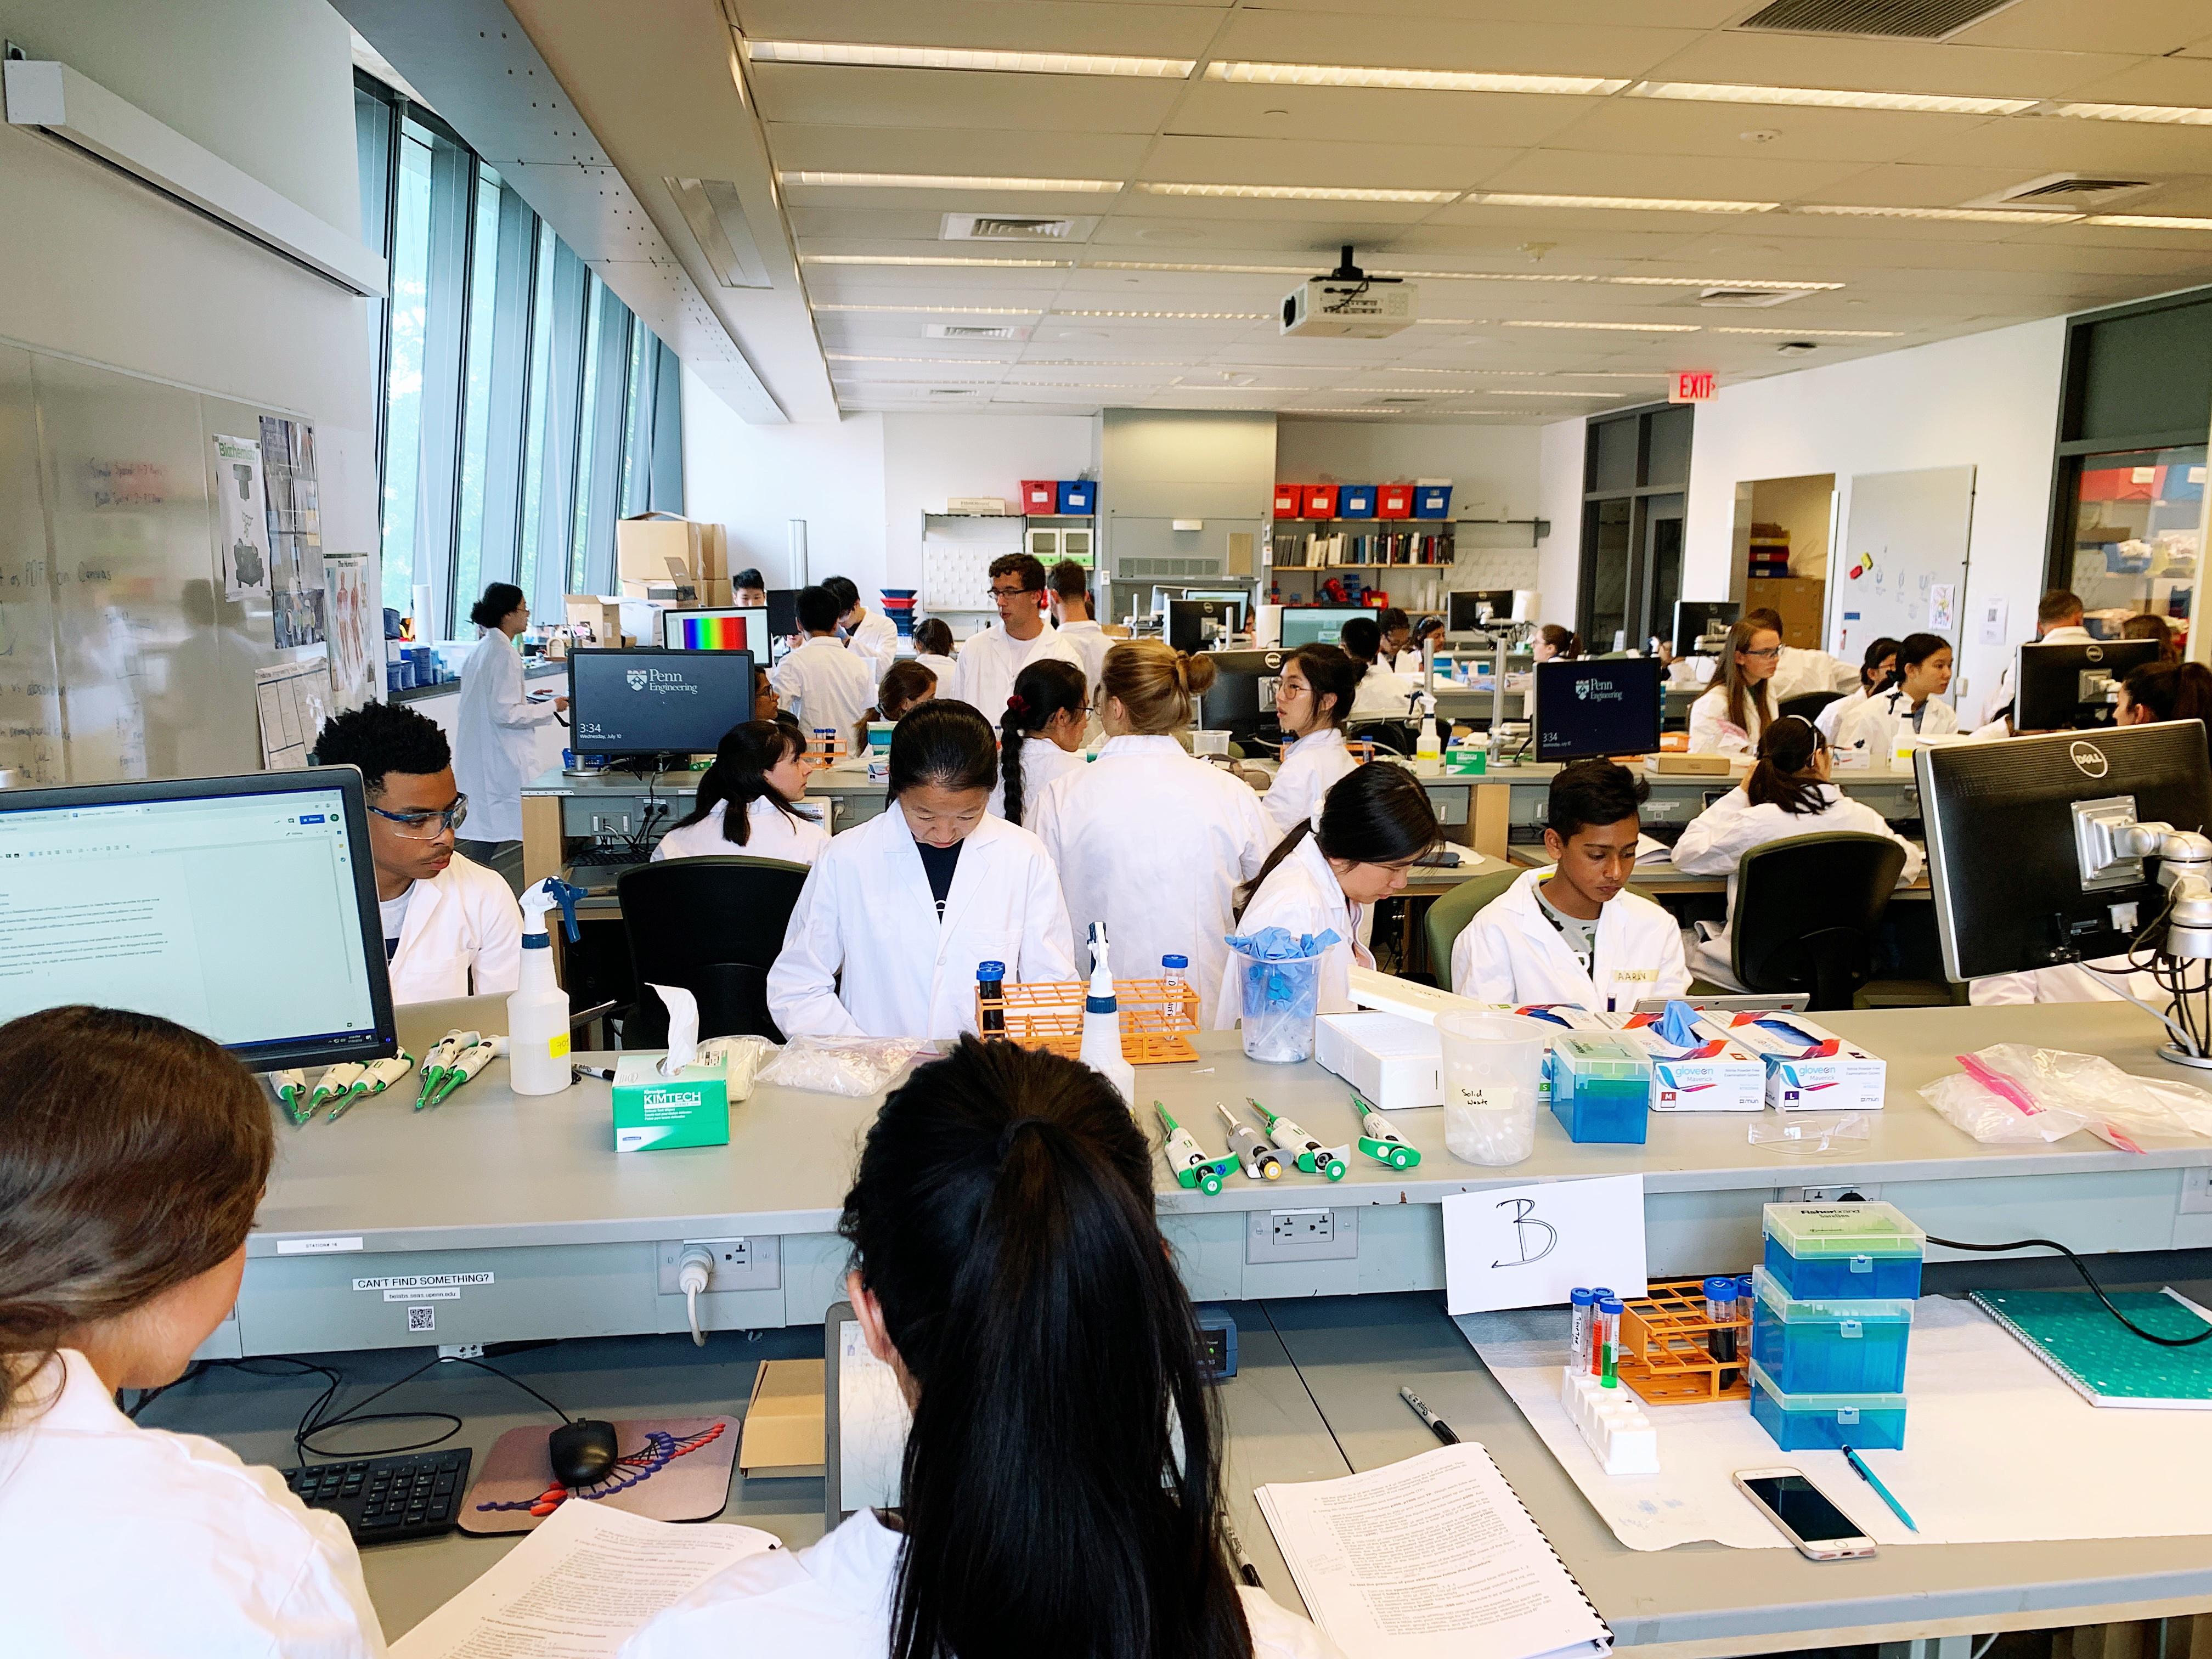 Summer Program - Bio Technology | Engineering Summer Academy at Penn